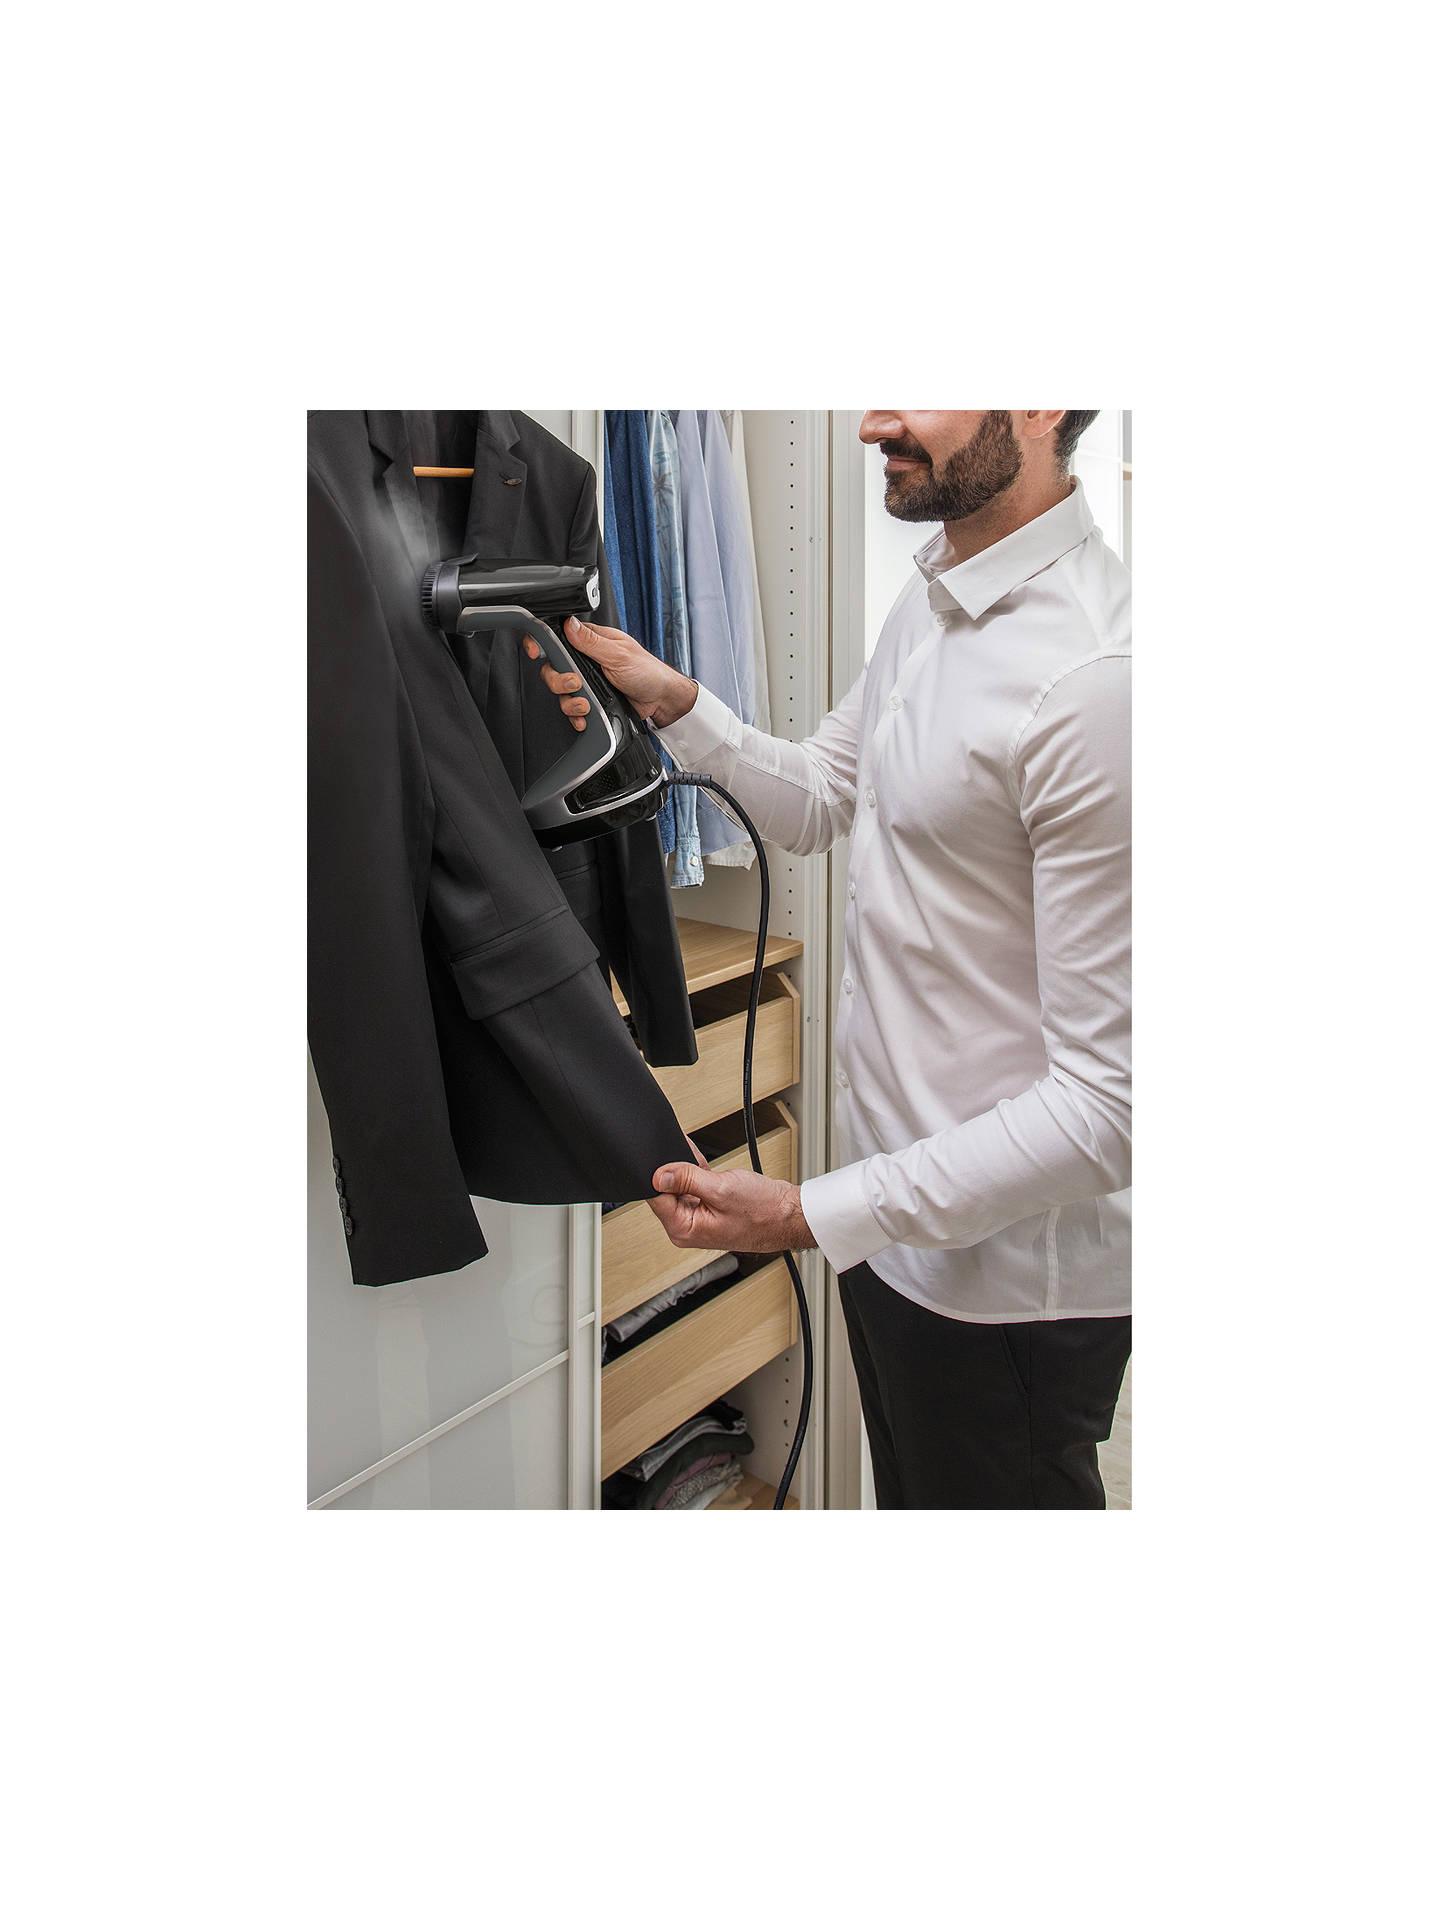 Tefal DT8150 Access Steam+ Handheld Garment Steamer